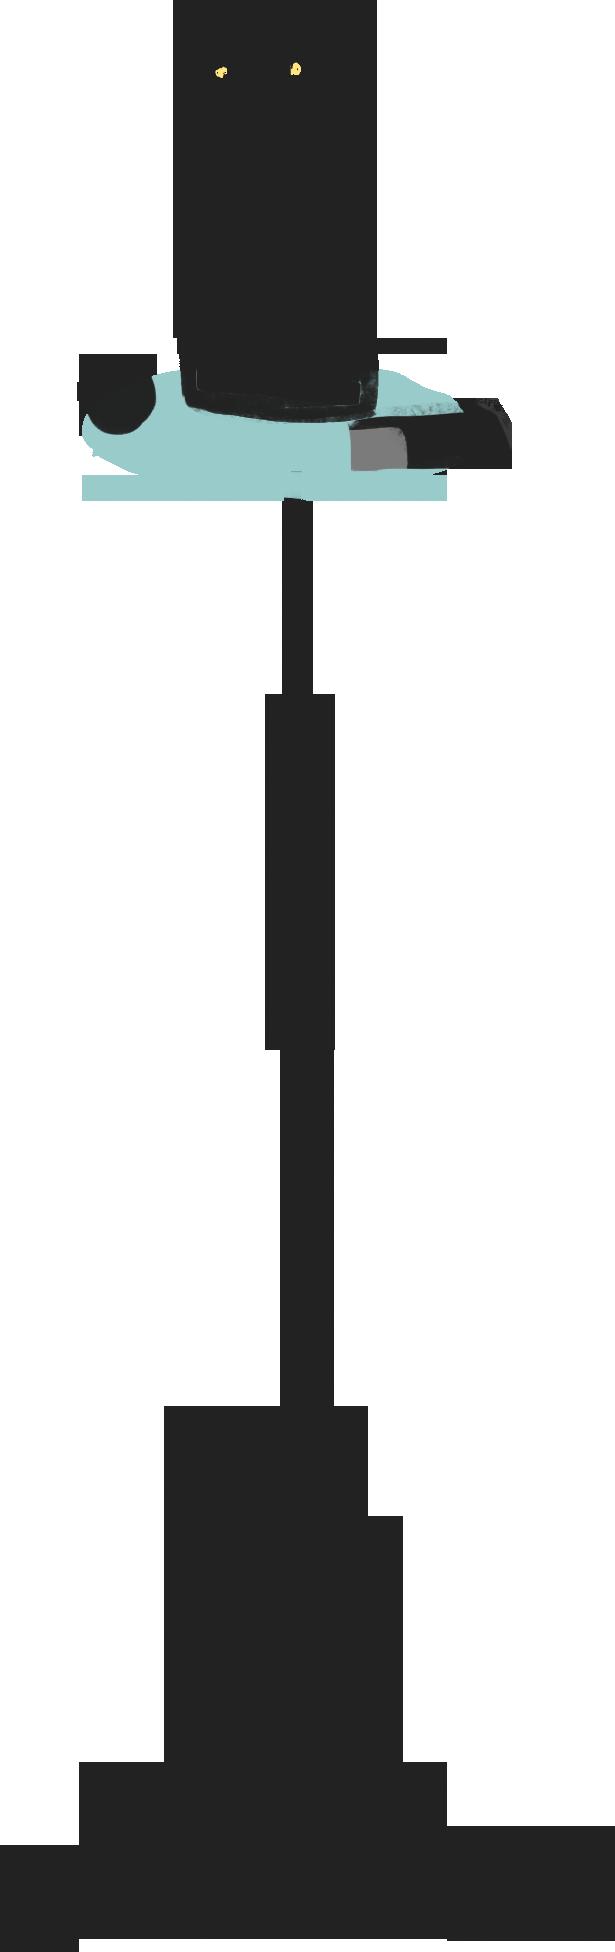 cat sculpture Clipart illustration in PNG, SVG